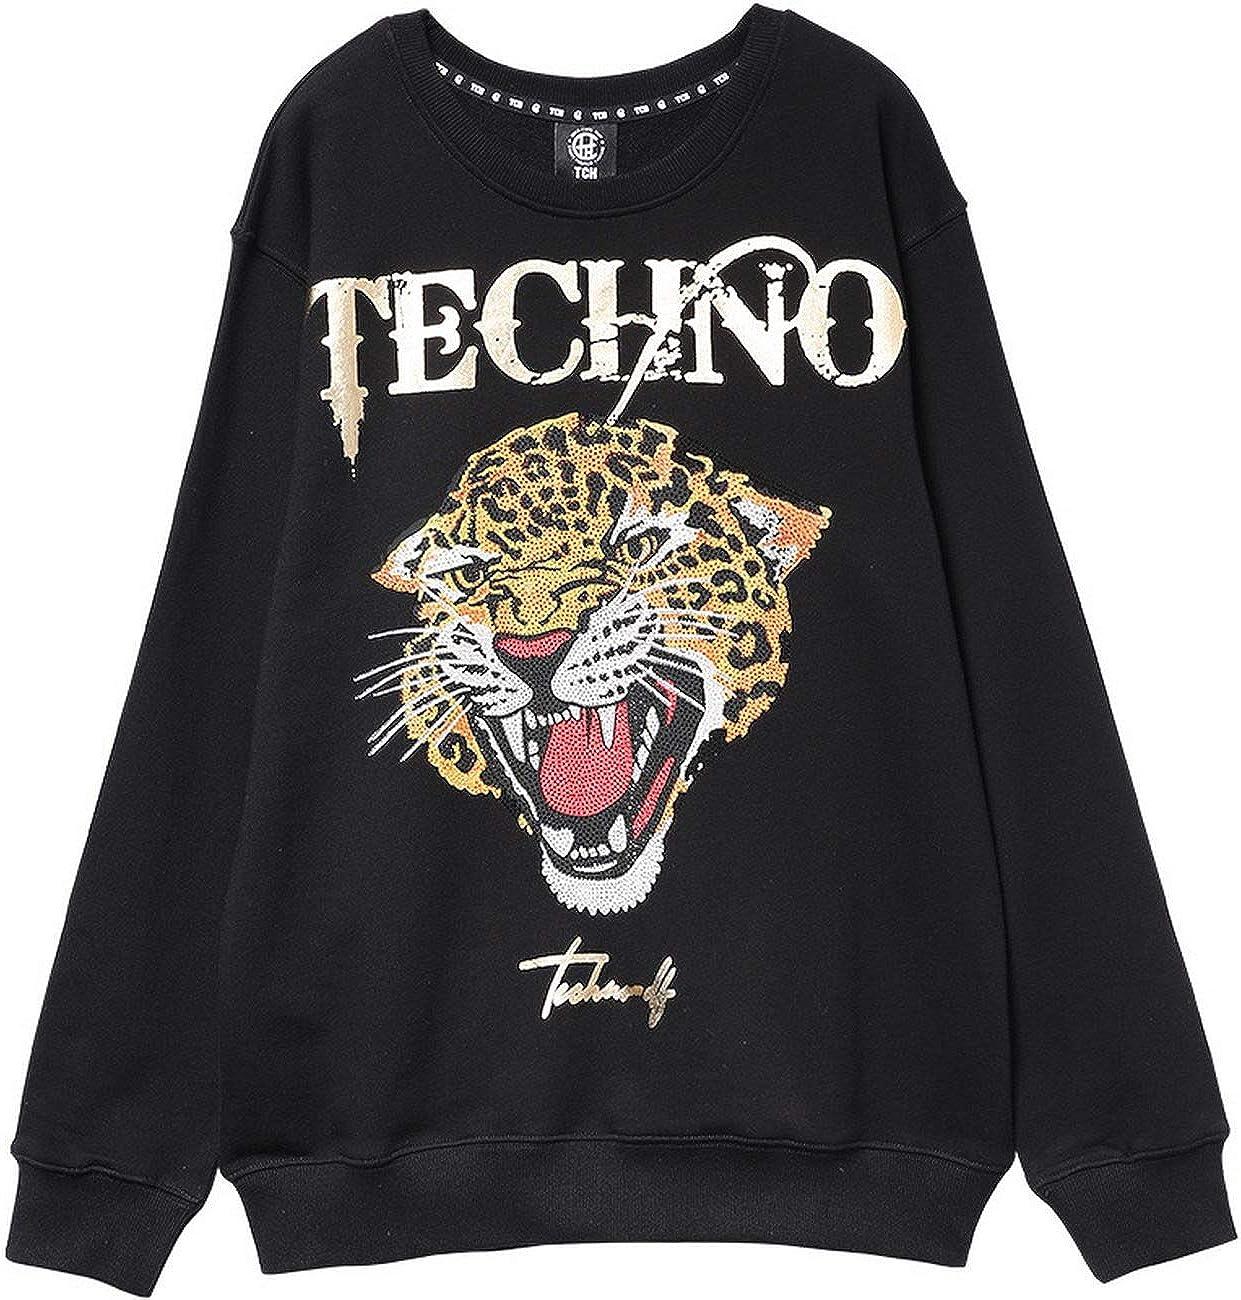 Light Luxury Tide Brand Big C hot Beads Round Neck Sweater Men and Women T203116D02 Money Online